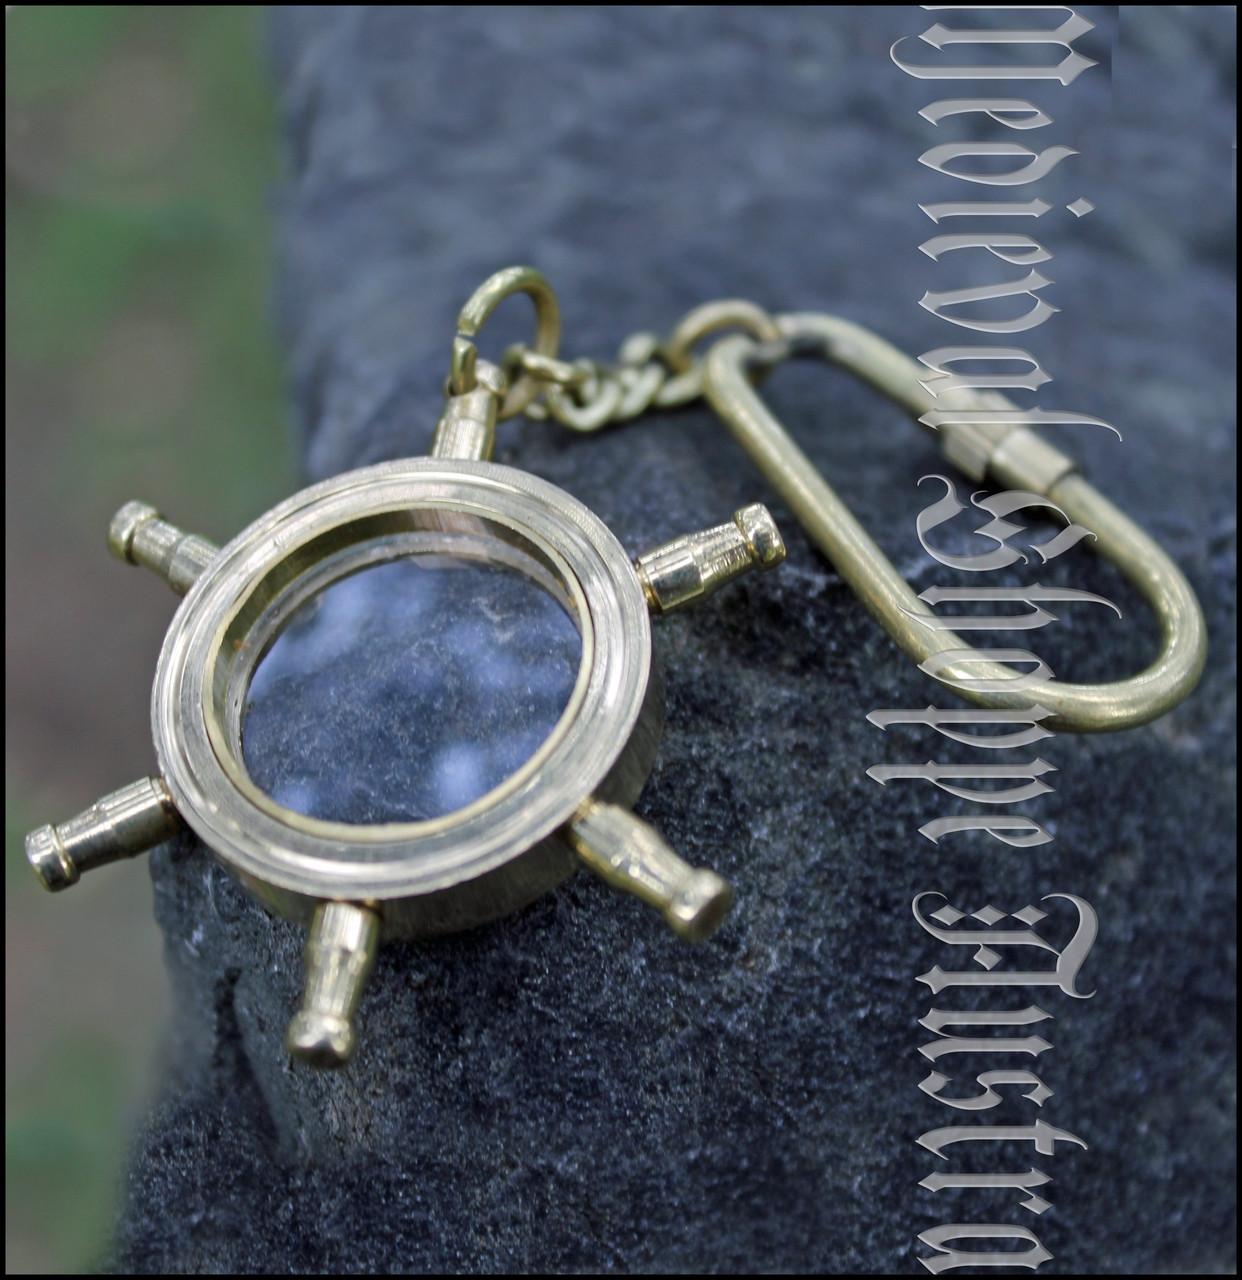 Ship's Wheel Magnifier Glass Key Chain